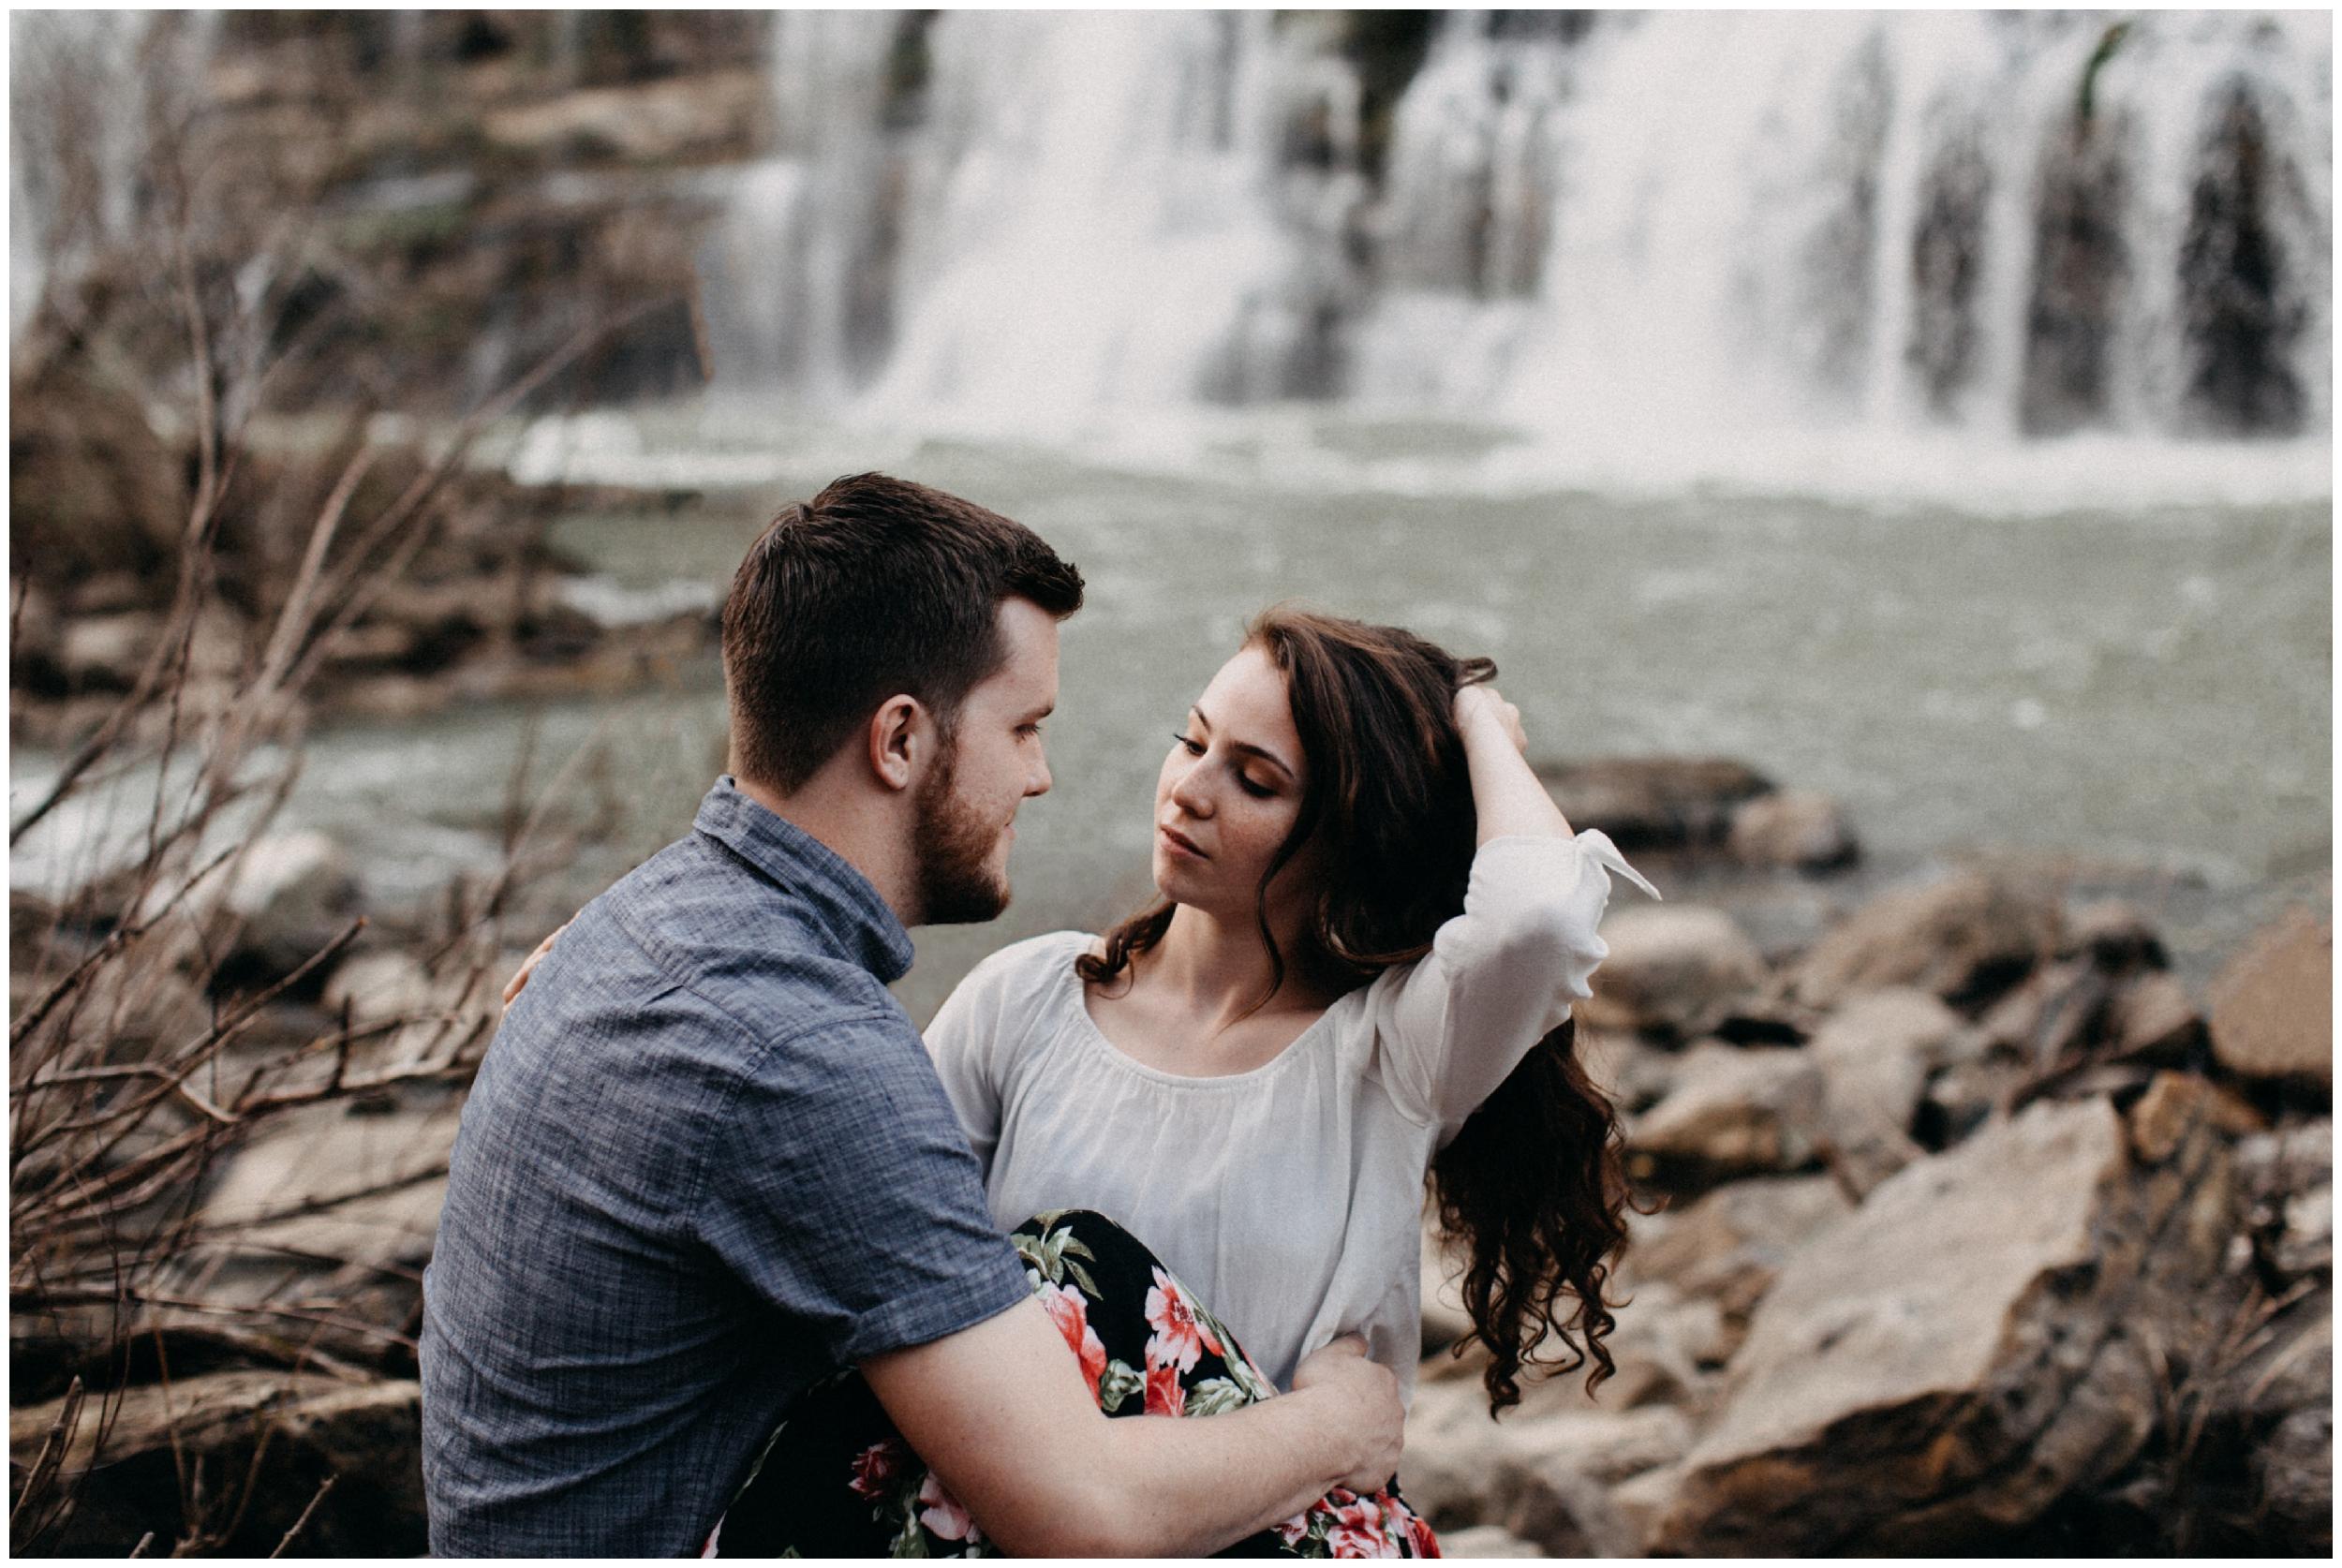 Engagement photography at Rock Island State park near Nashville, TN